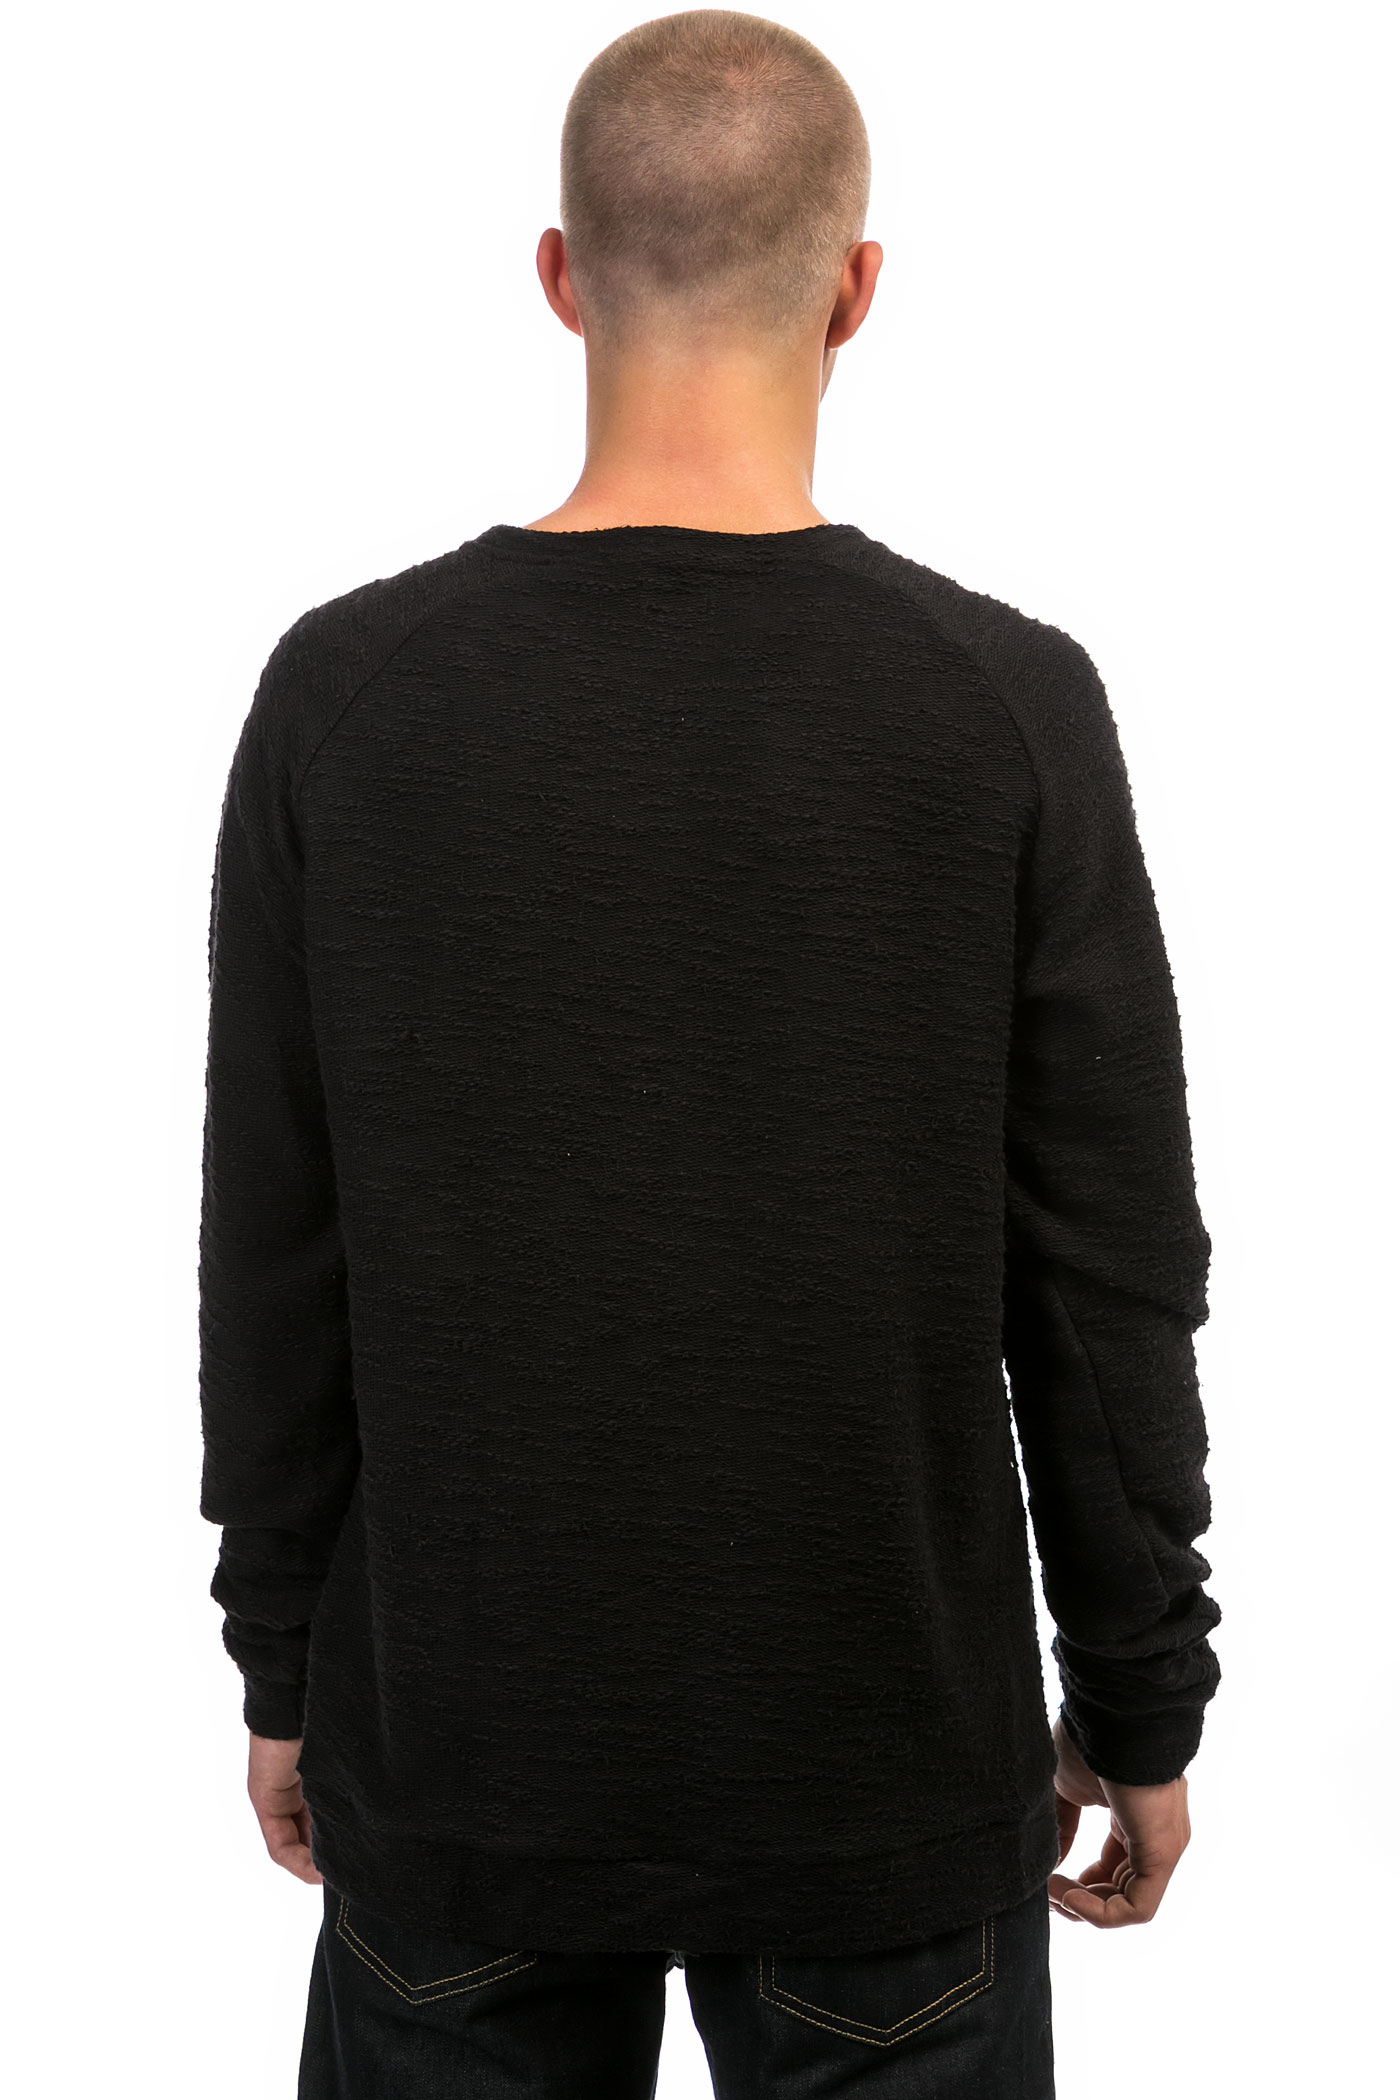 forvert casper sweatshirt black kaufen bei skatedeluxe. Black Bedroom Furniture Sets. Home Design Ideas